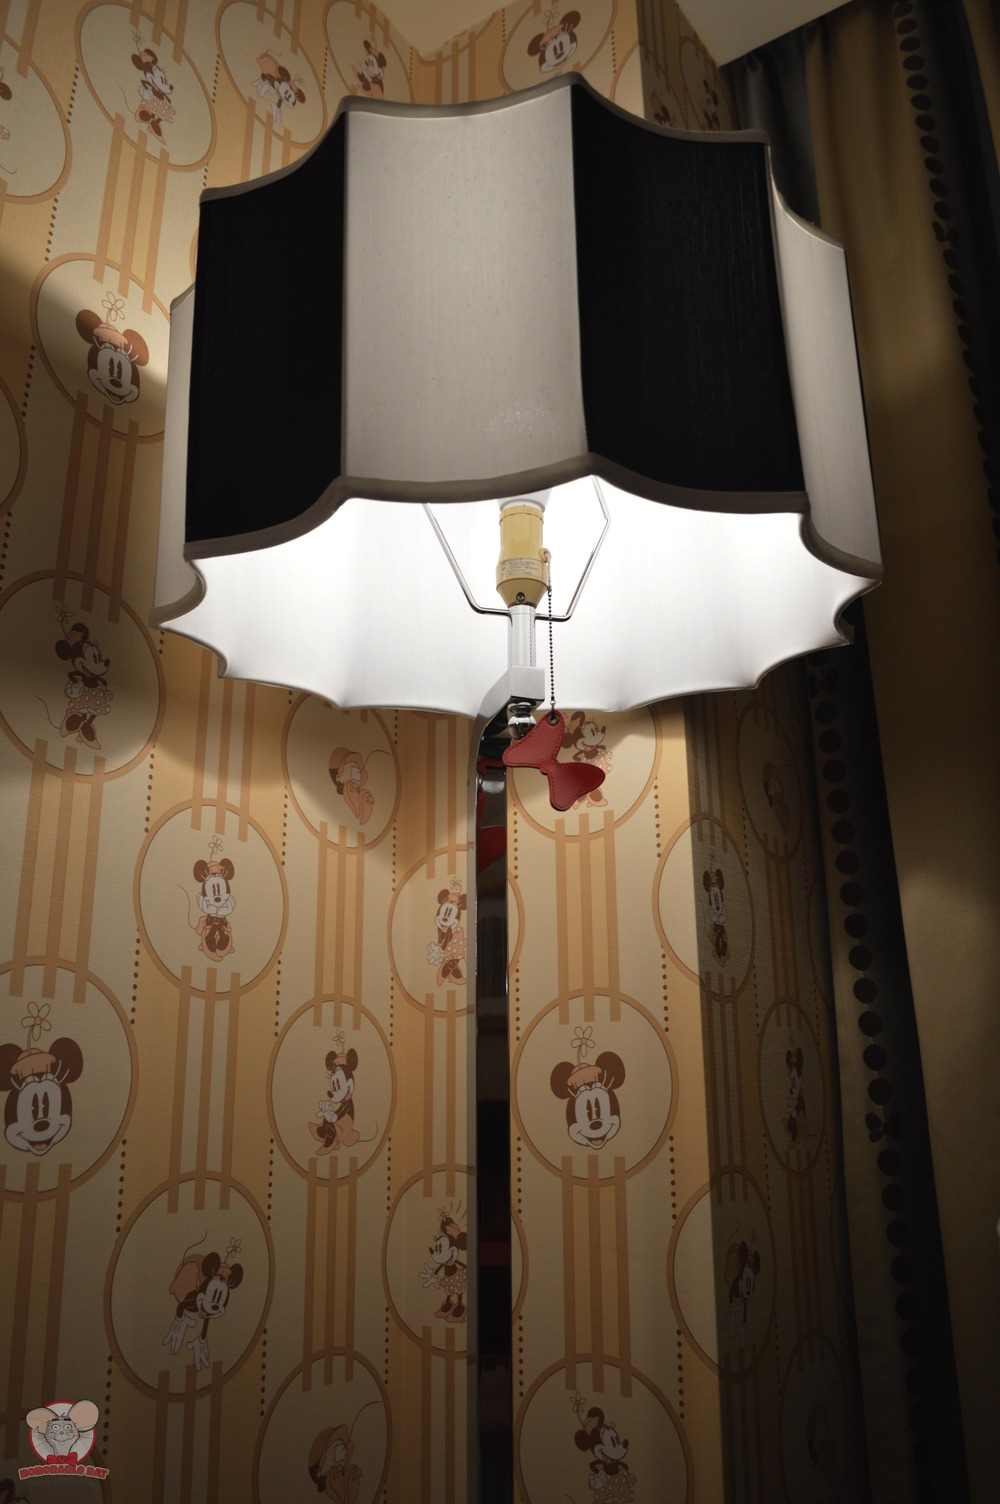 Minnie light stand